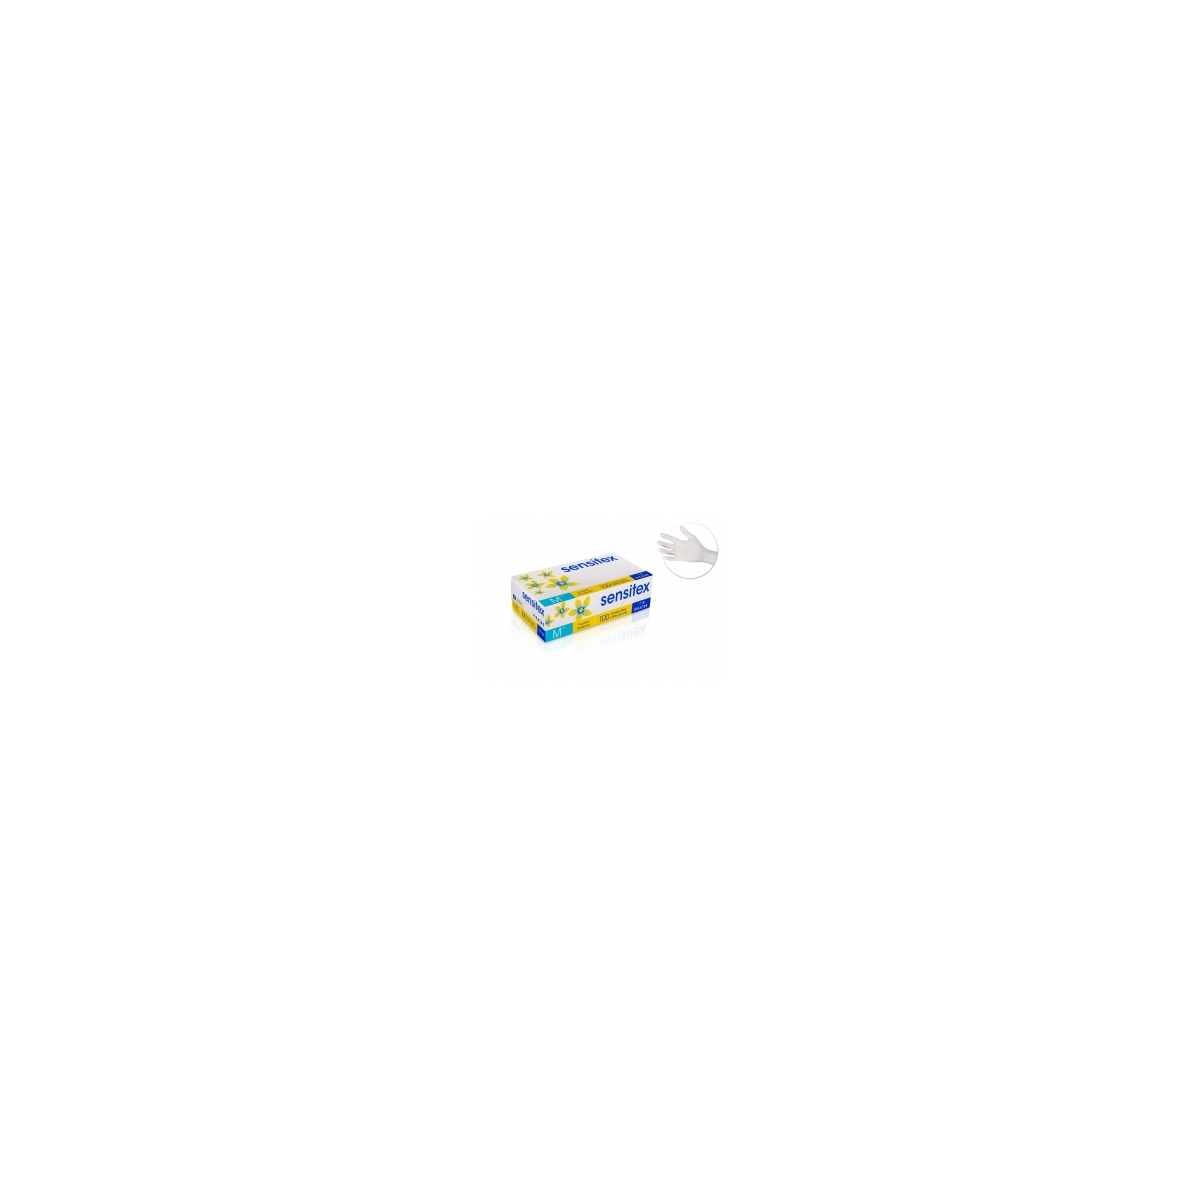 PROTECTIONS - SENSITEX - GANTS LATEX BLANC (x100)